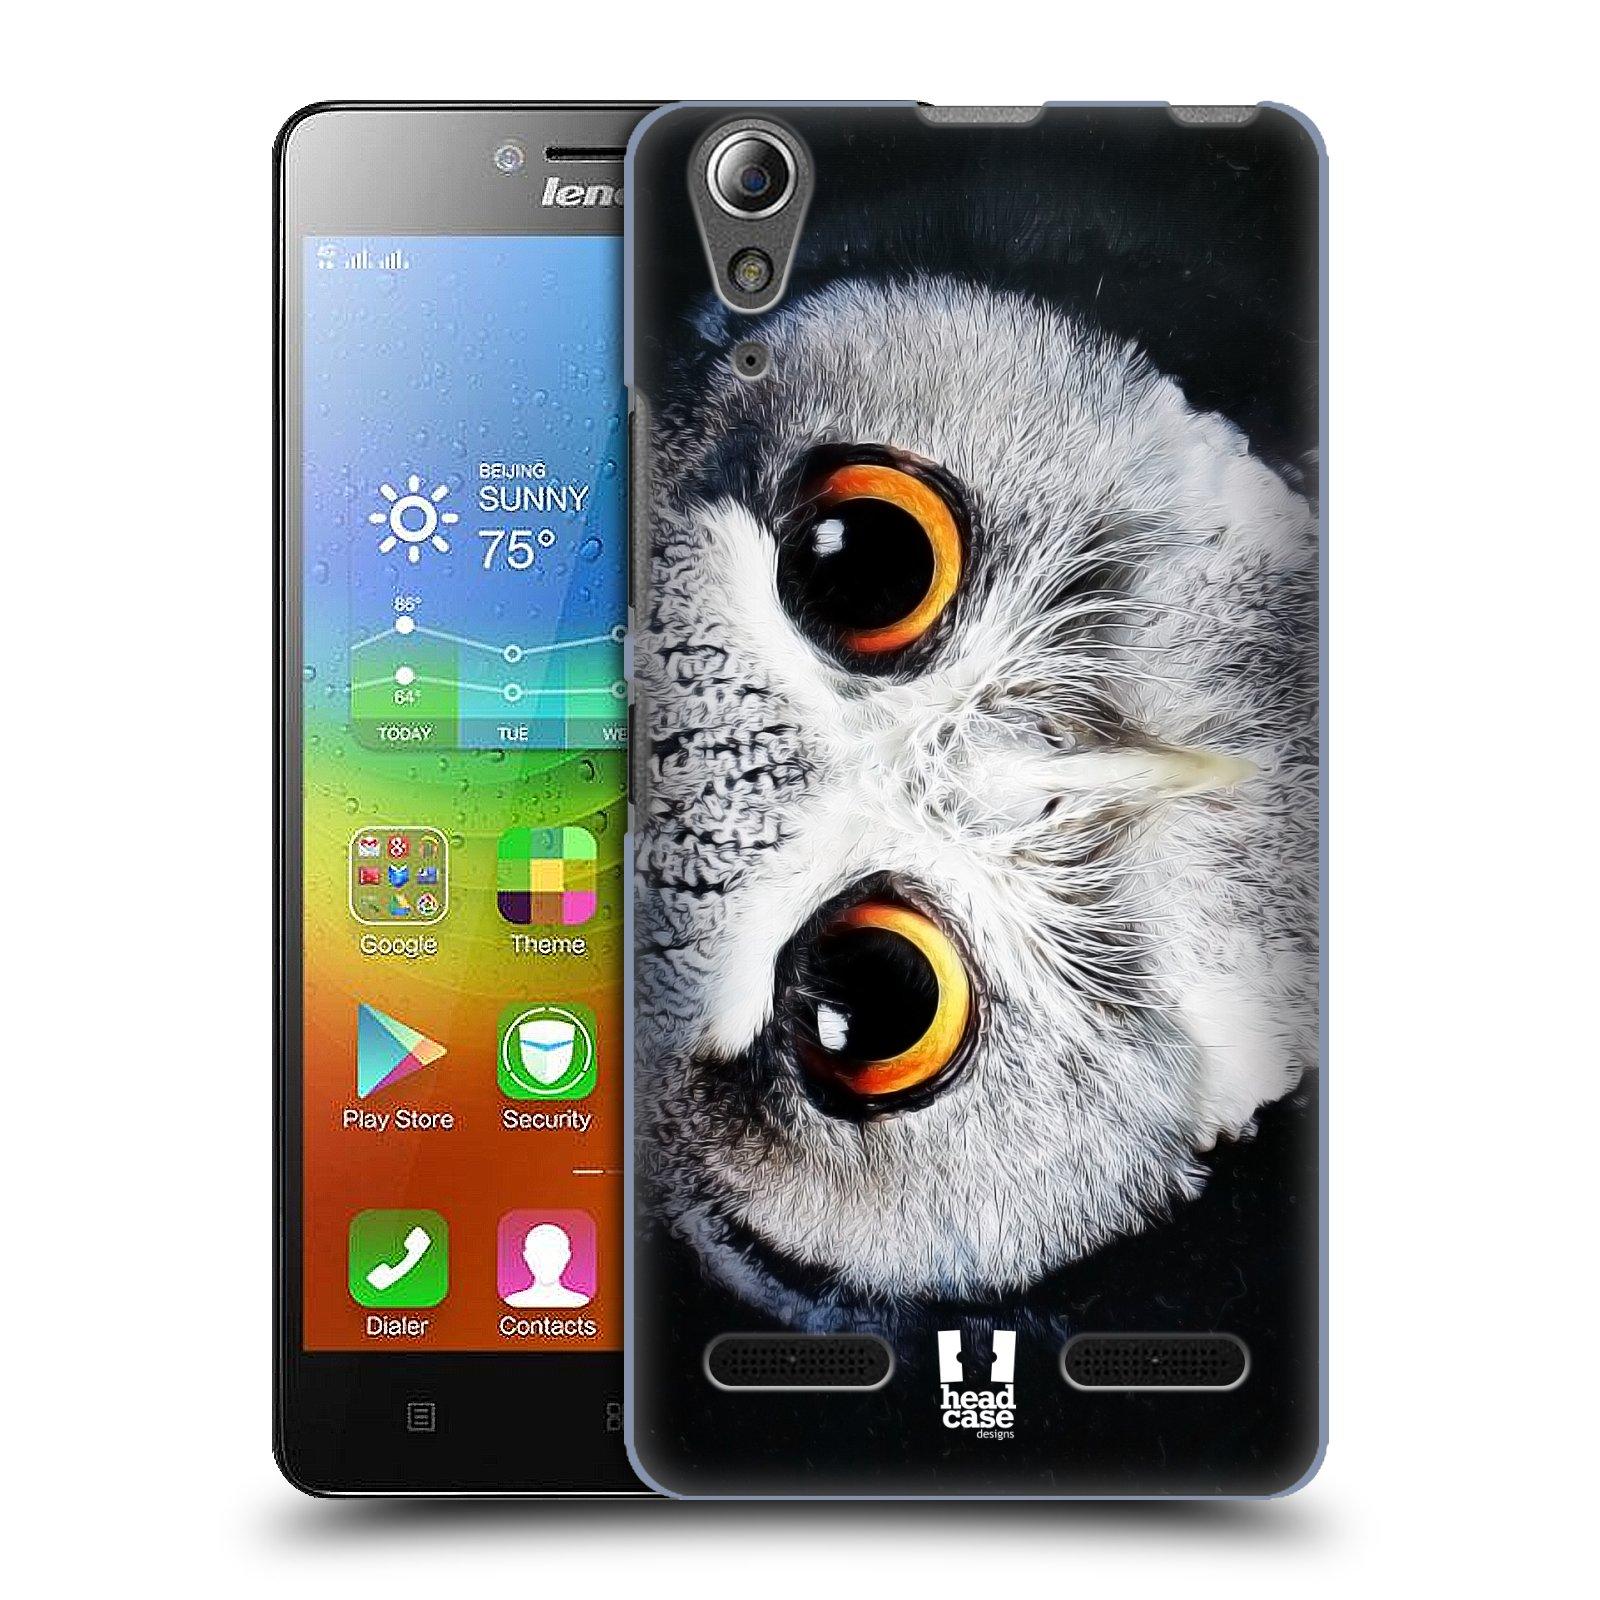 HEAD CASE pevný plastový obal na mobil LENOVO A6000 / A6000 PLUS vzor Zvířecí tváře sova